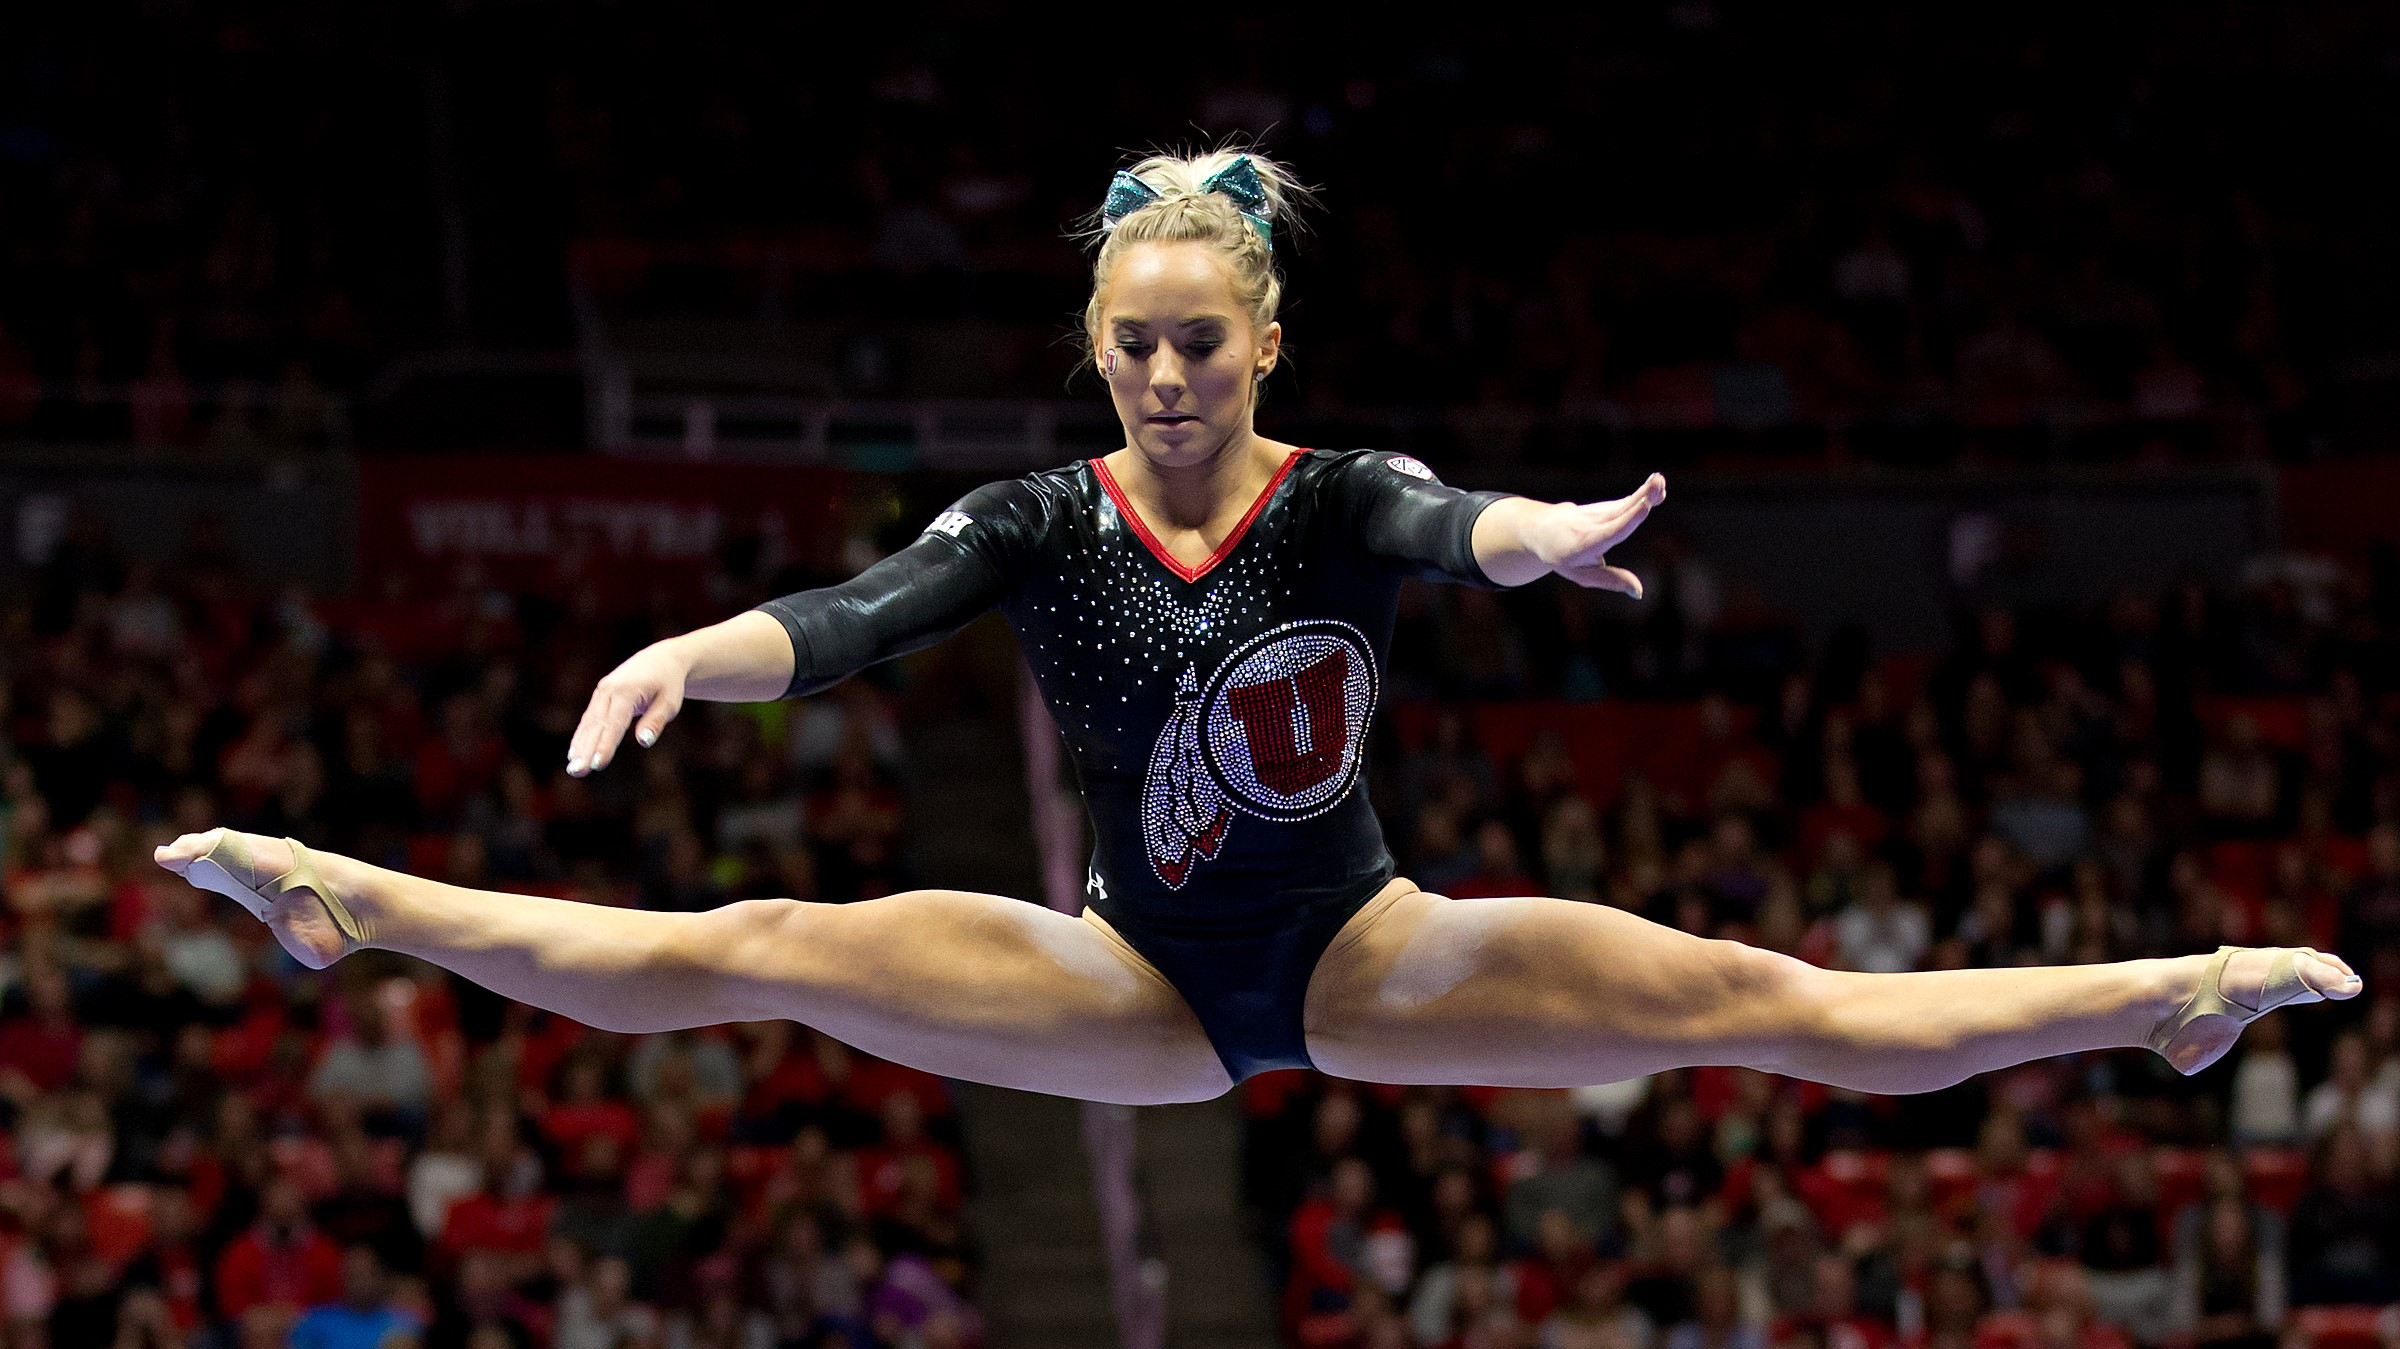 MyKayla Skinner - Gymnast